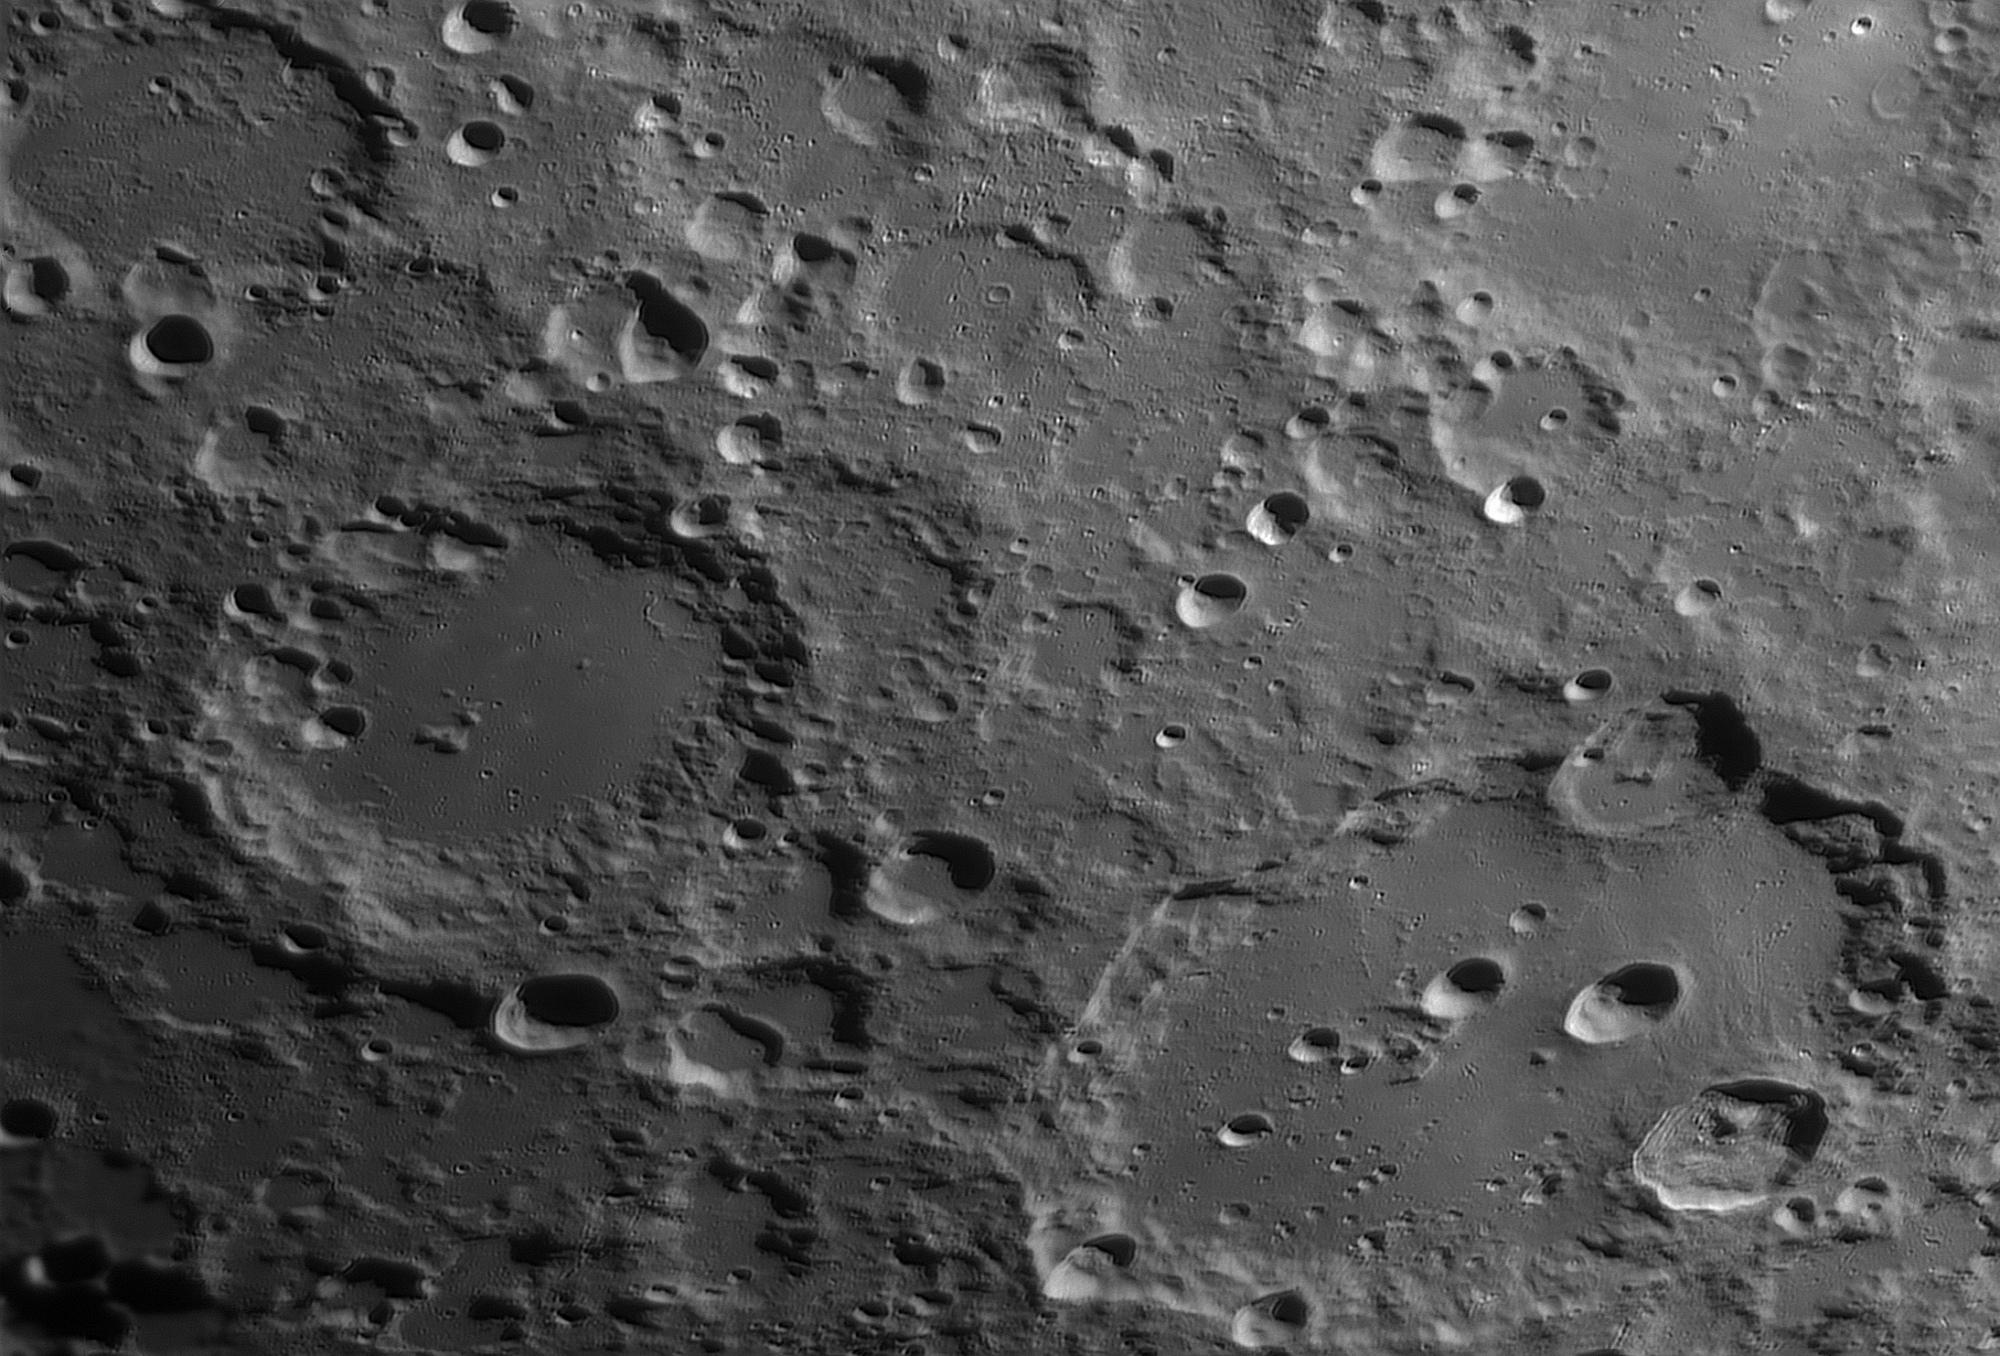 20200403_190511_Moon_W23A_Clavius.thumb.jpg.ae15115d69fb33c2bc71c5e25ddc26e8.jpg